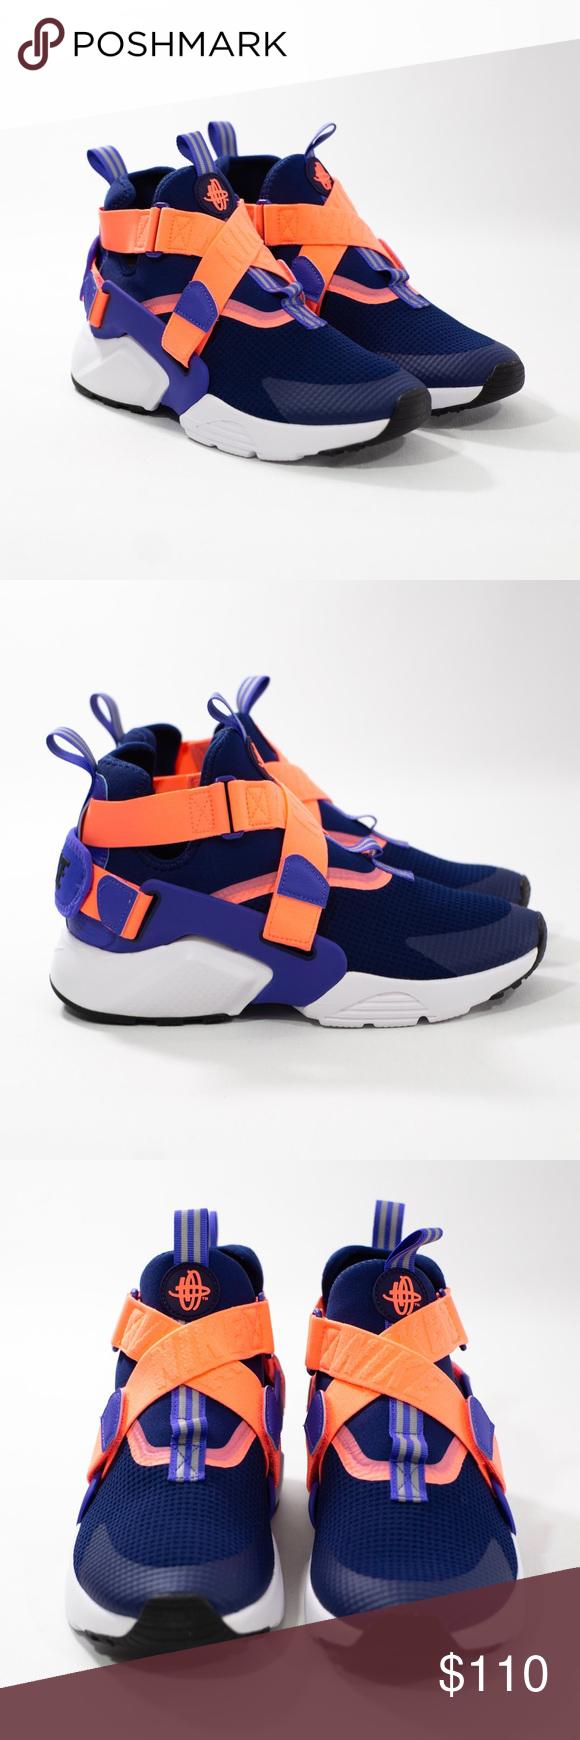 GS Youth sneakers AJ6662 403 Multiple sizes Nike Huarache City